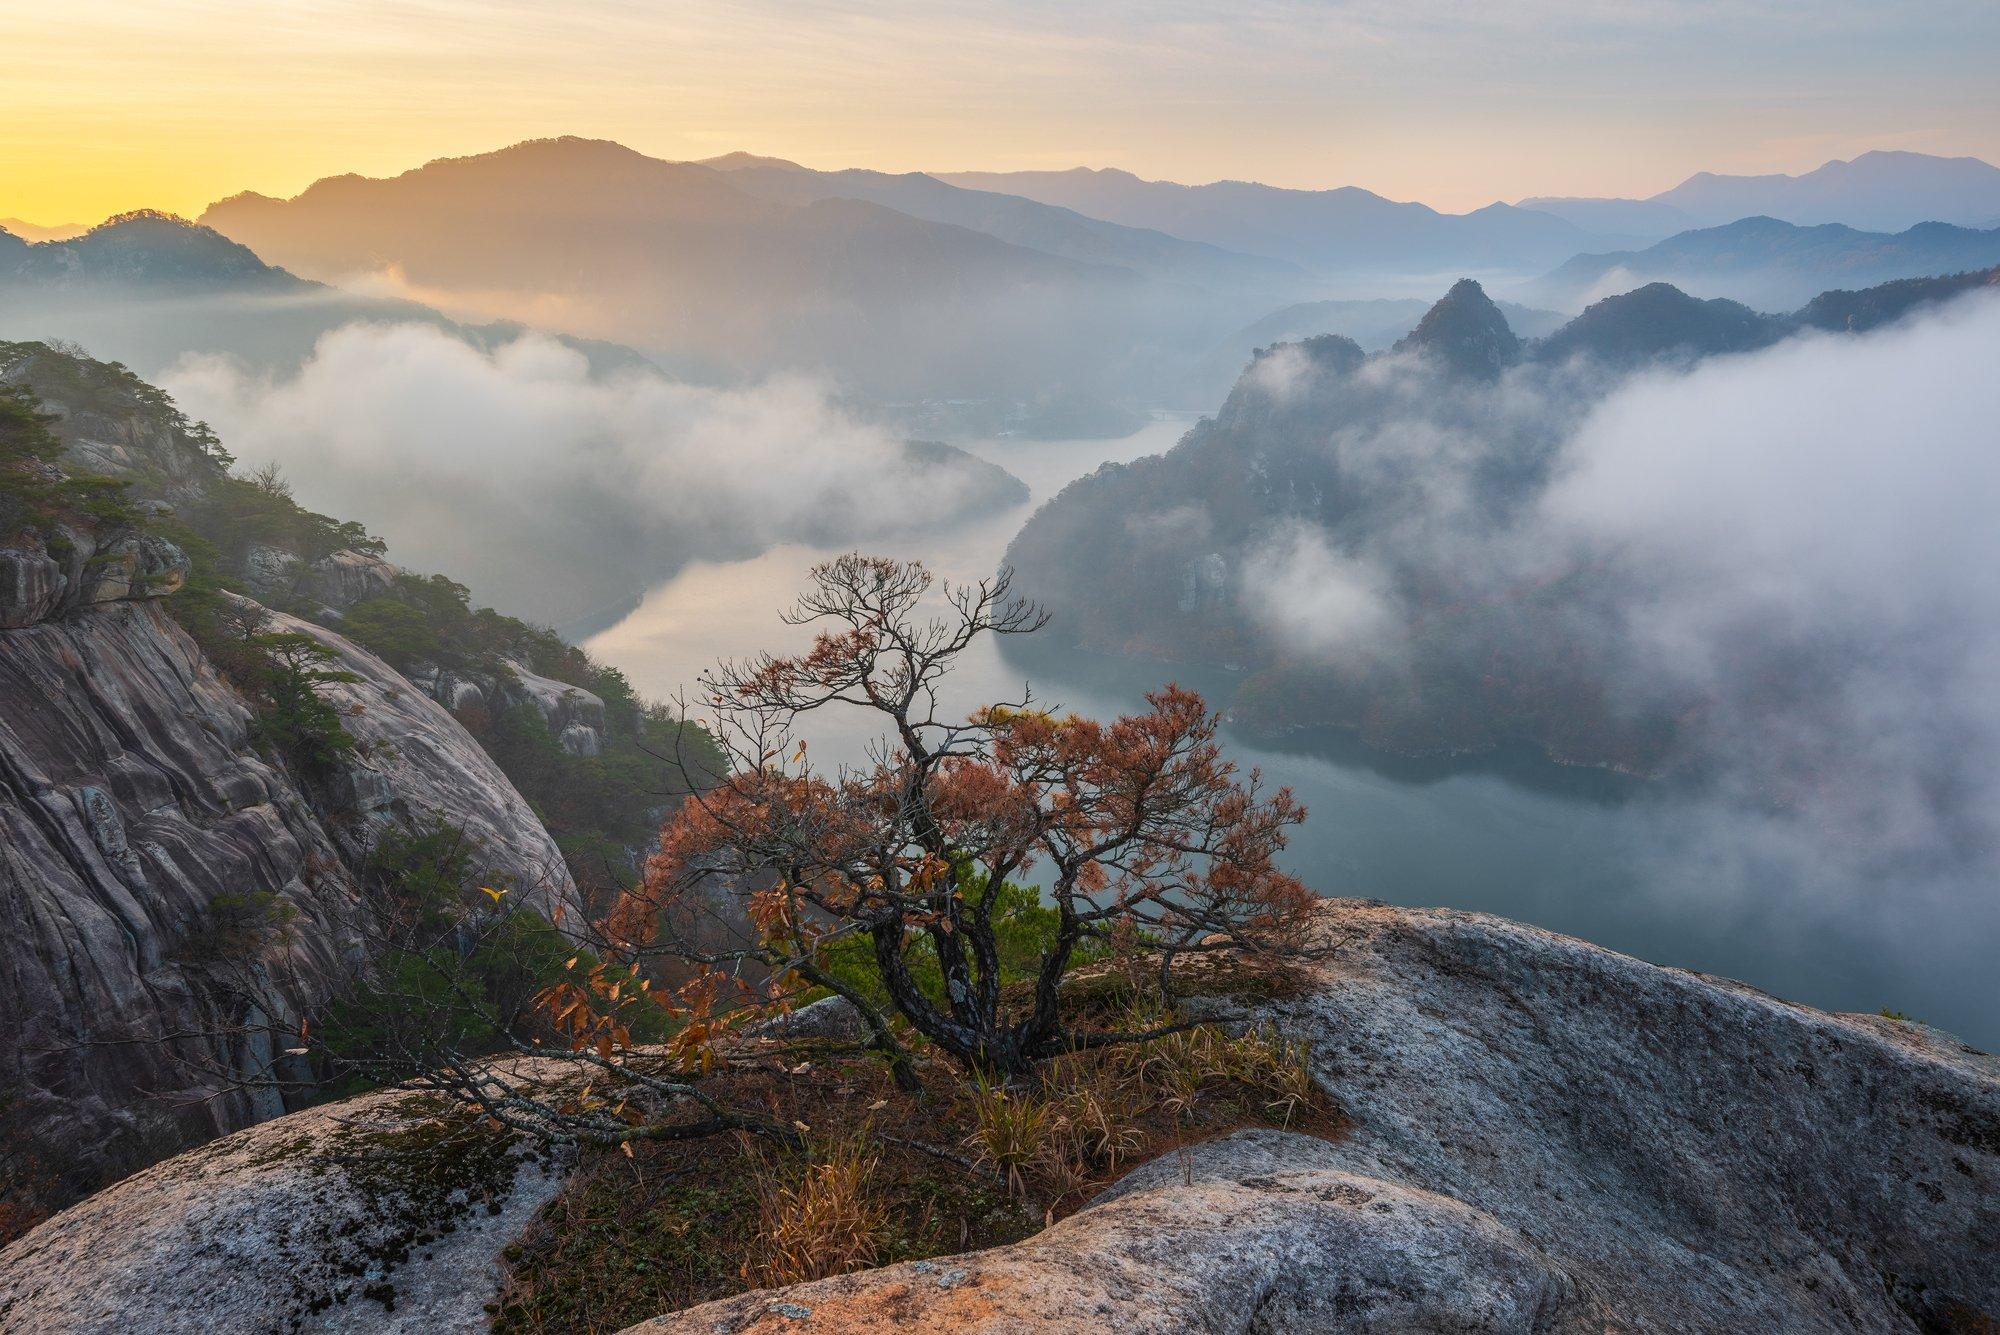 pine, mountains, rocks, clouds, 류재윤